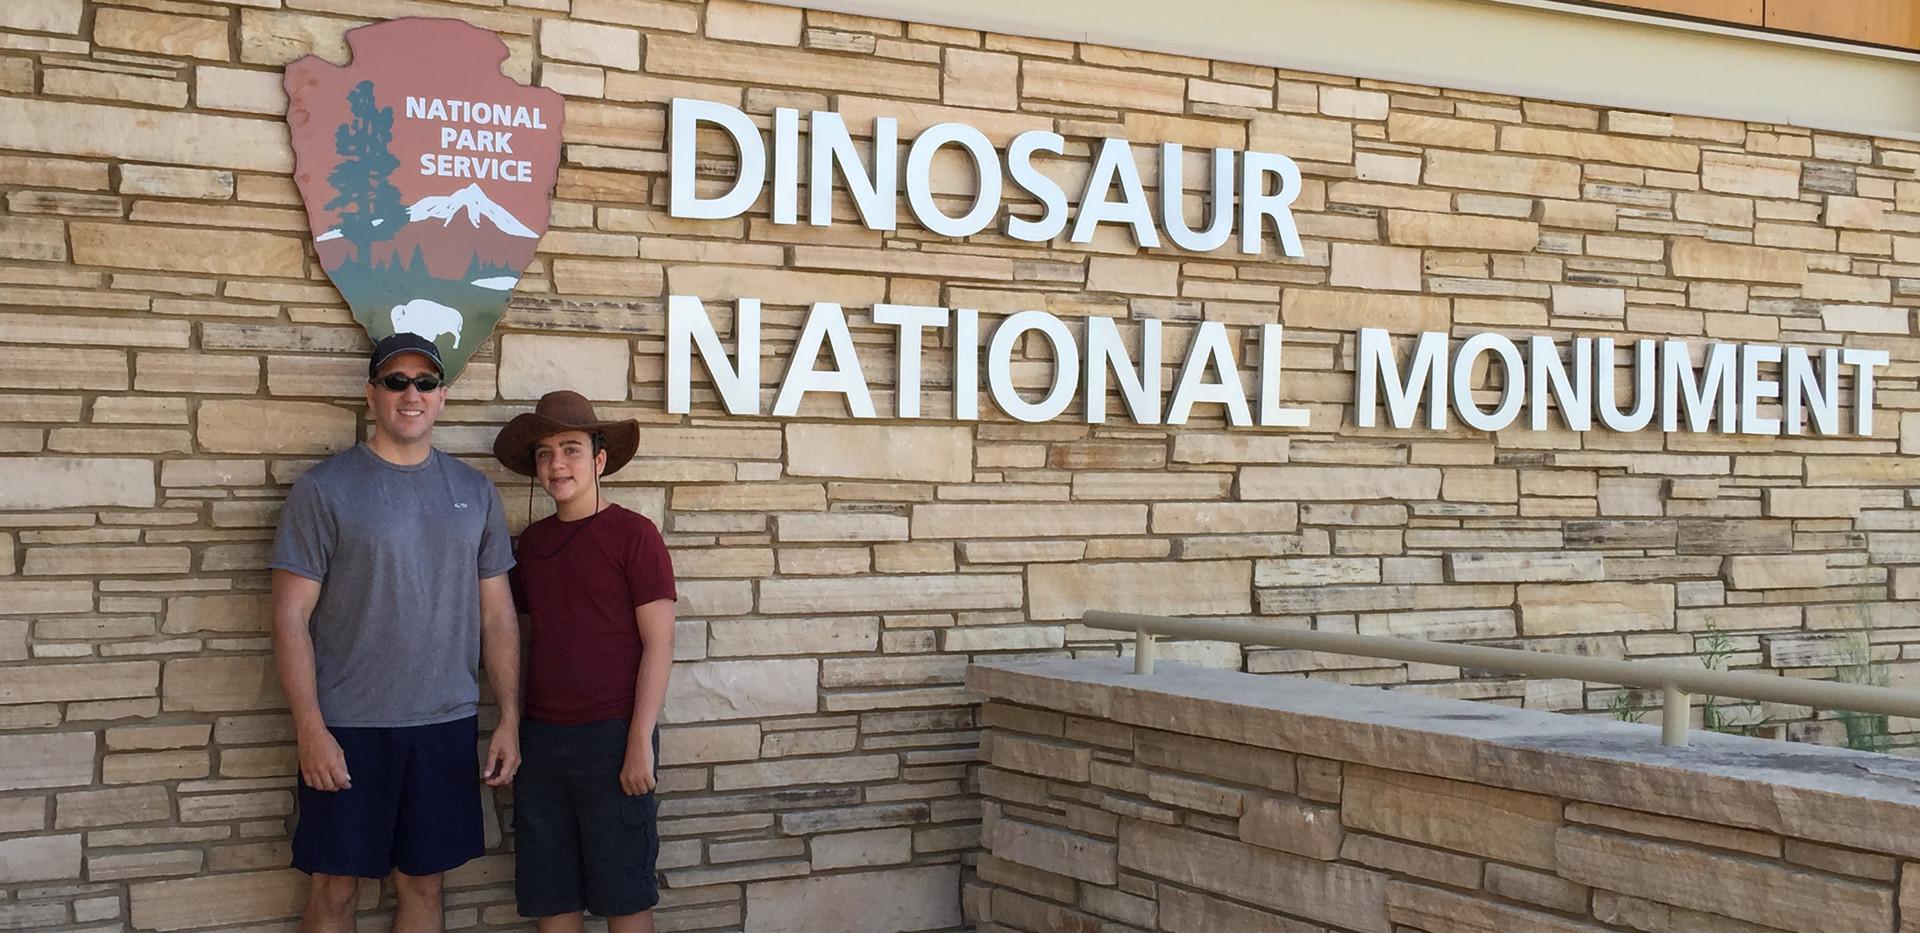 Dinosaur National Monument (2015)